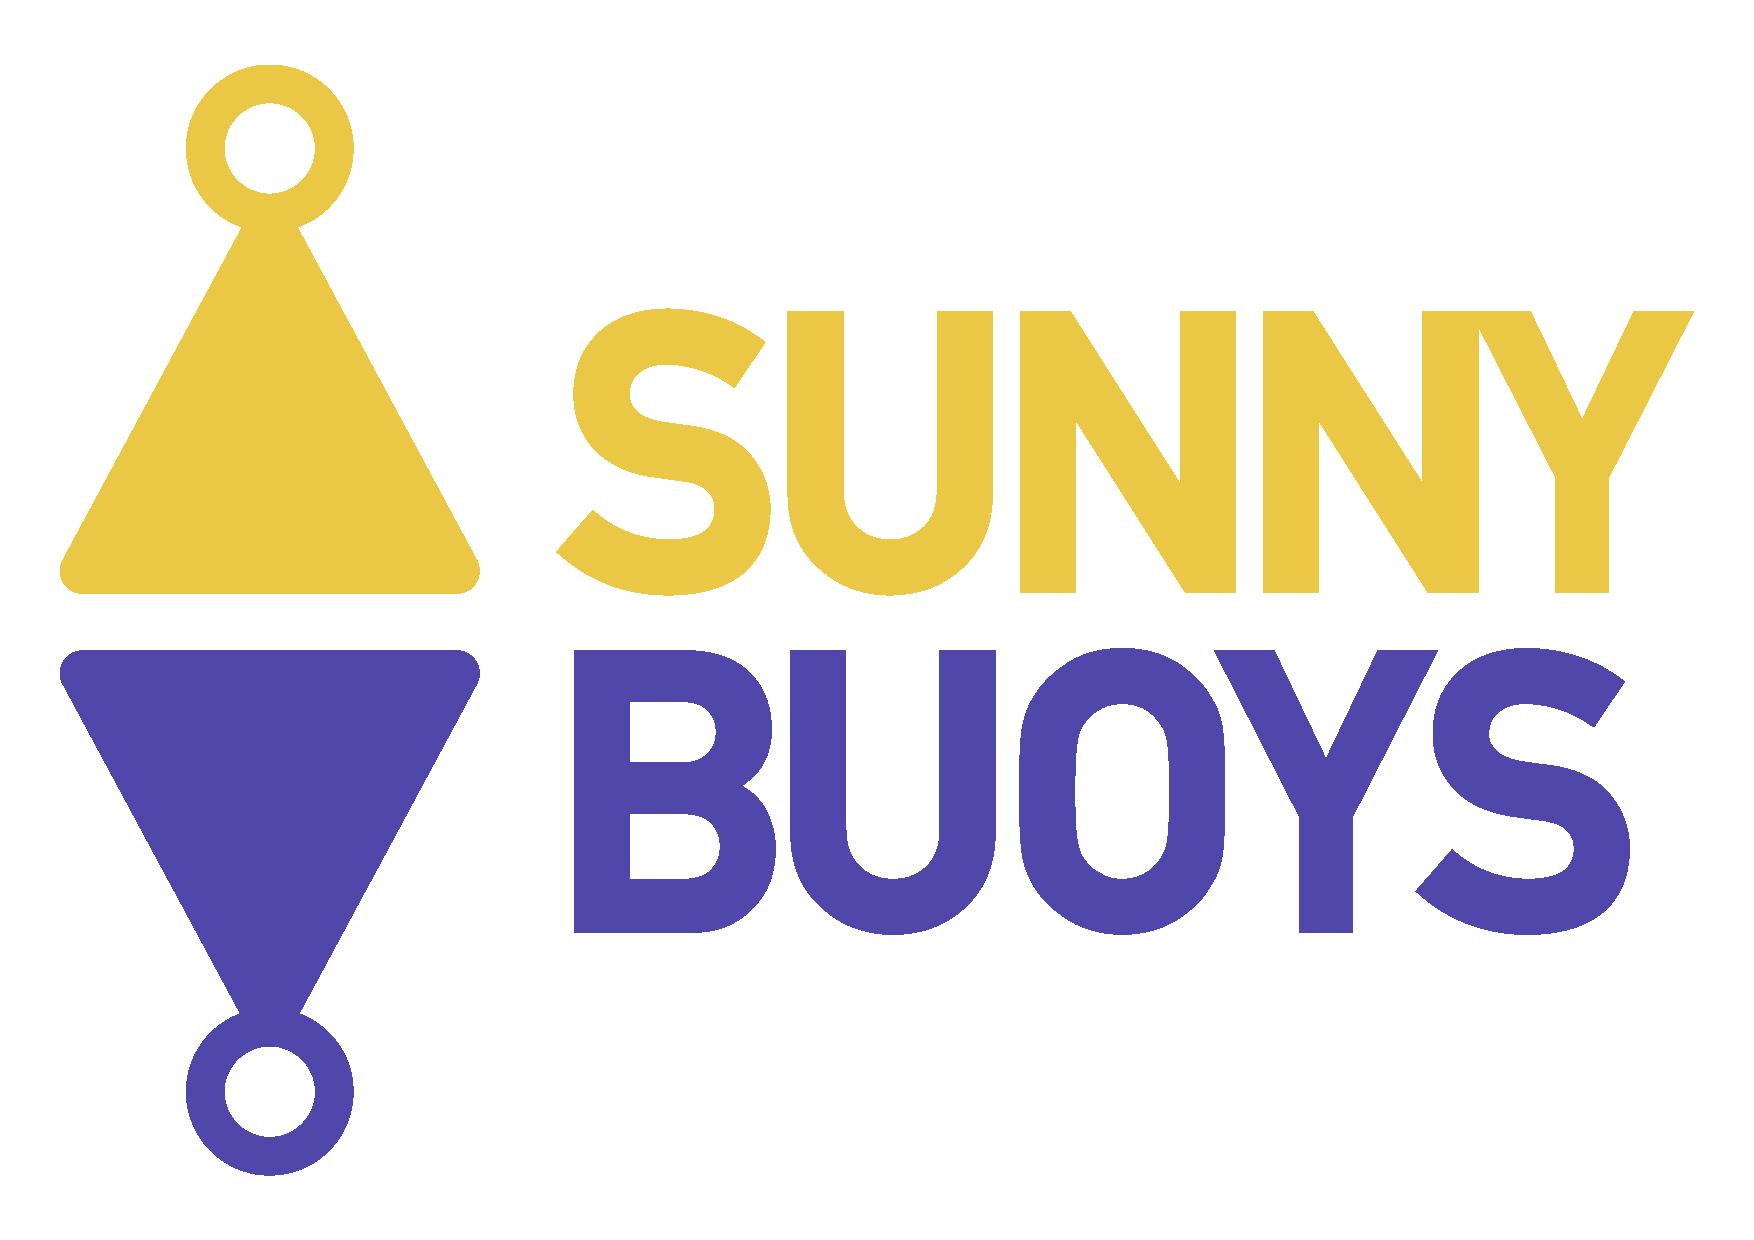 sunnybuoys